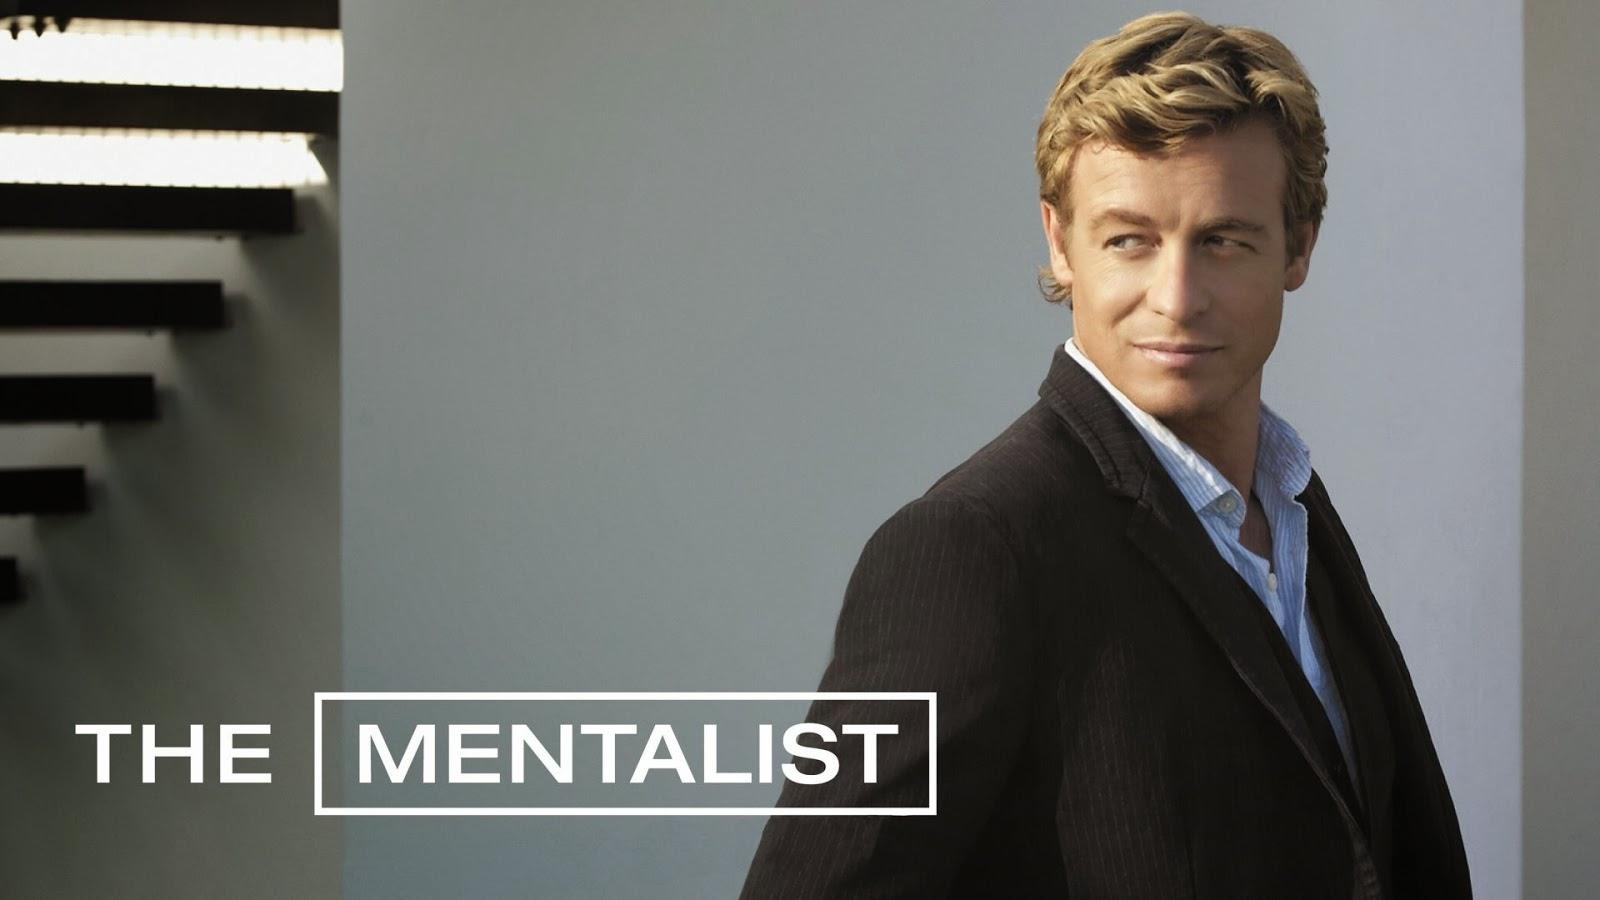 http://www.episodegenerator.com/wp-content/uploads/molly-hagan-the-mentalist.jpg